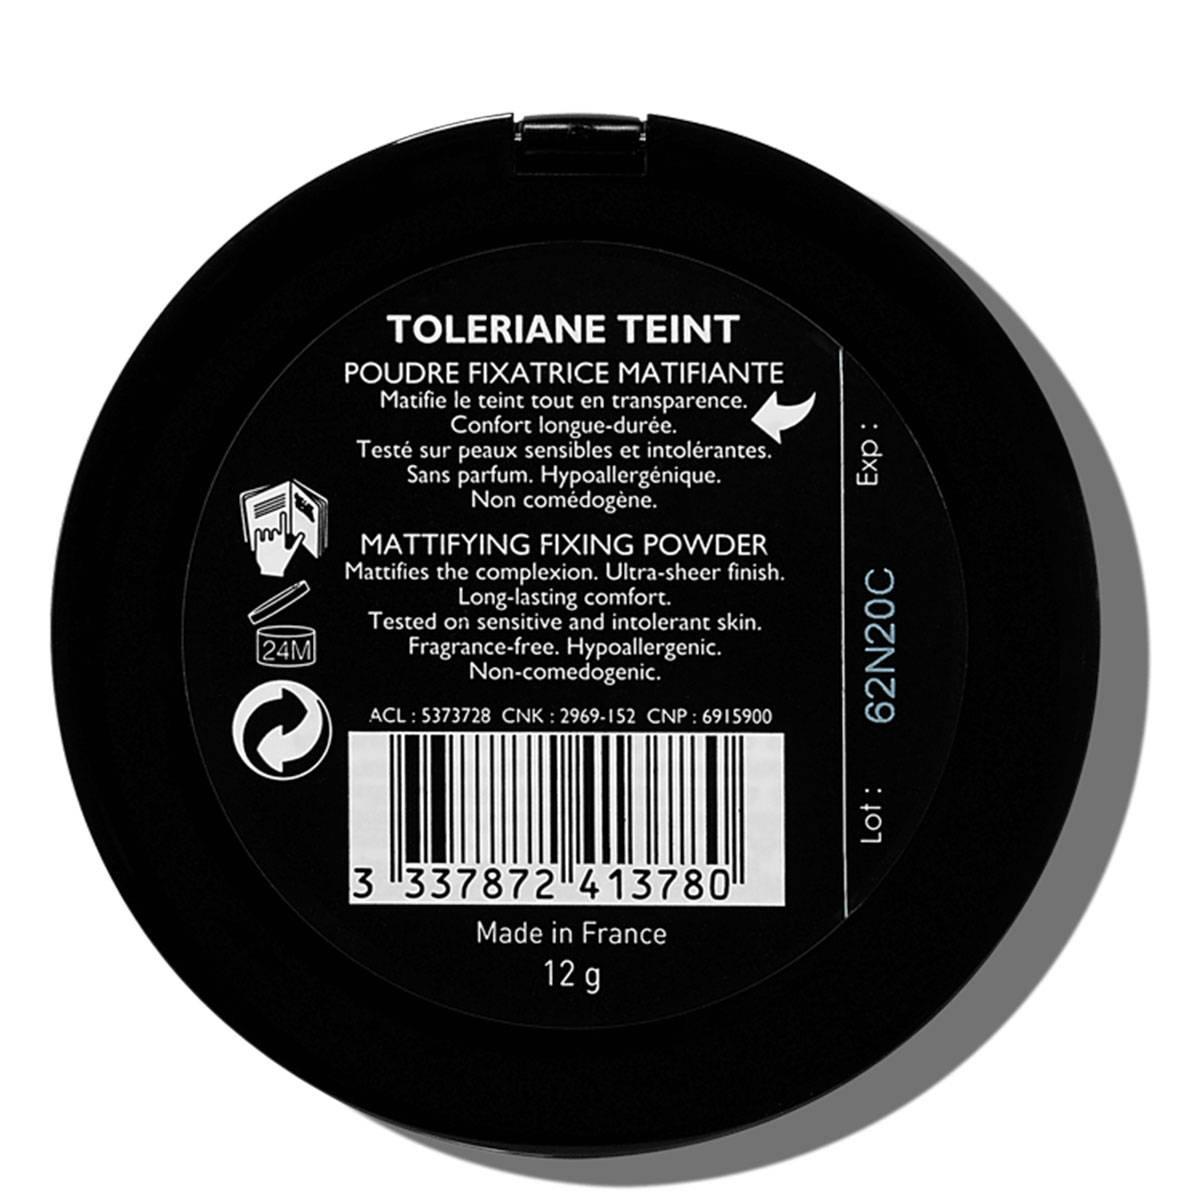 La Roche Posay Sensitive Toleriane Make up TEINT Fixation 3337872413780